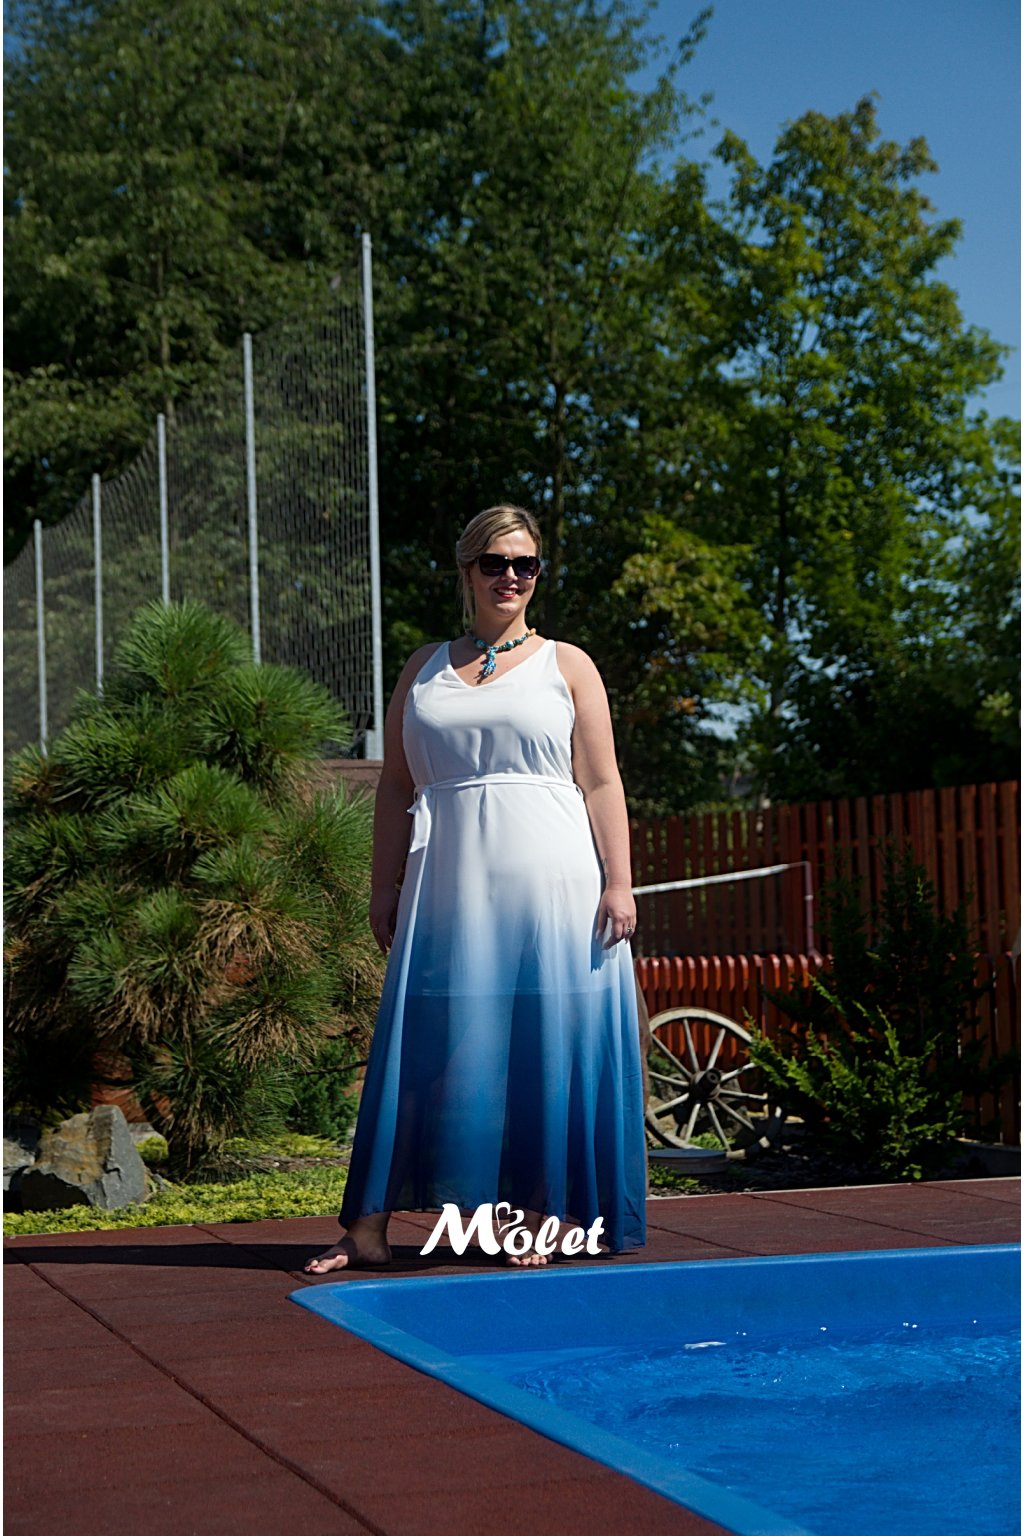 Taboo modrobílé šaty